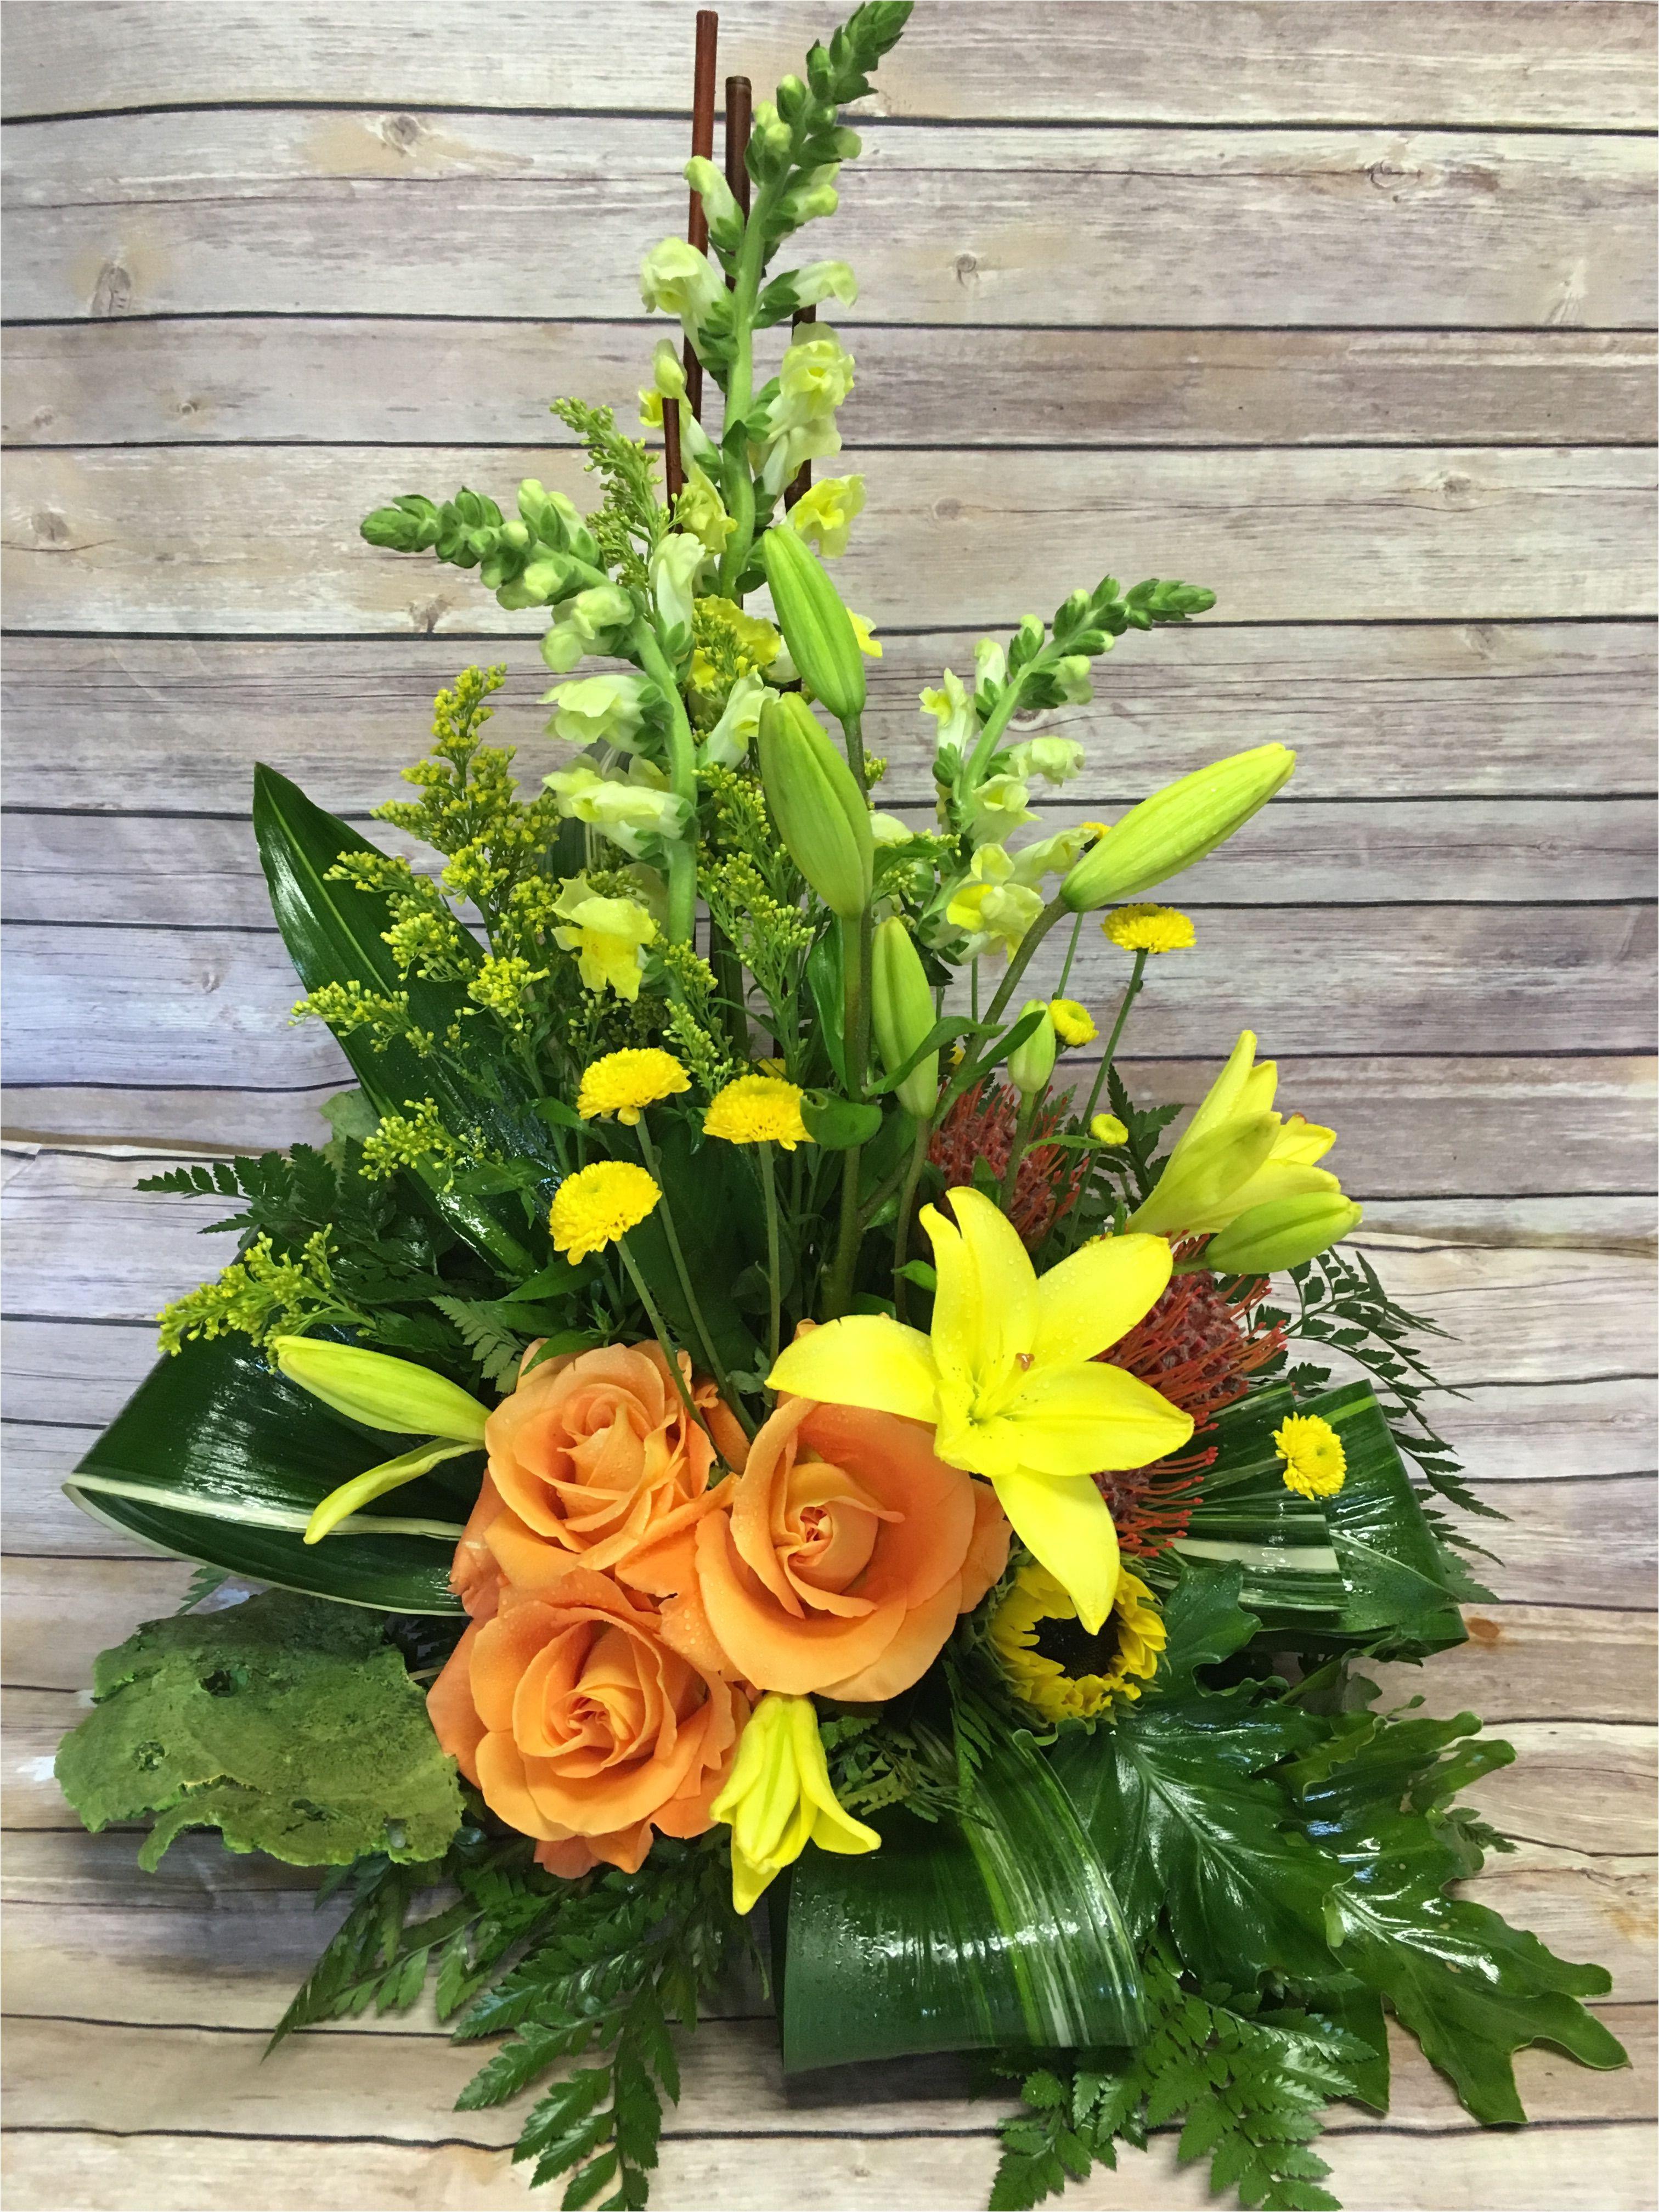 centro de flores artificiales adorno floral disea o floral centros florales areglos florales